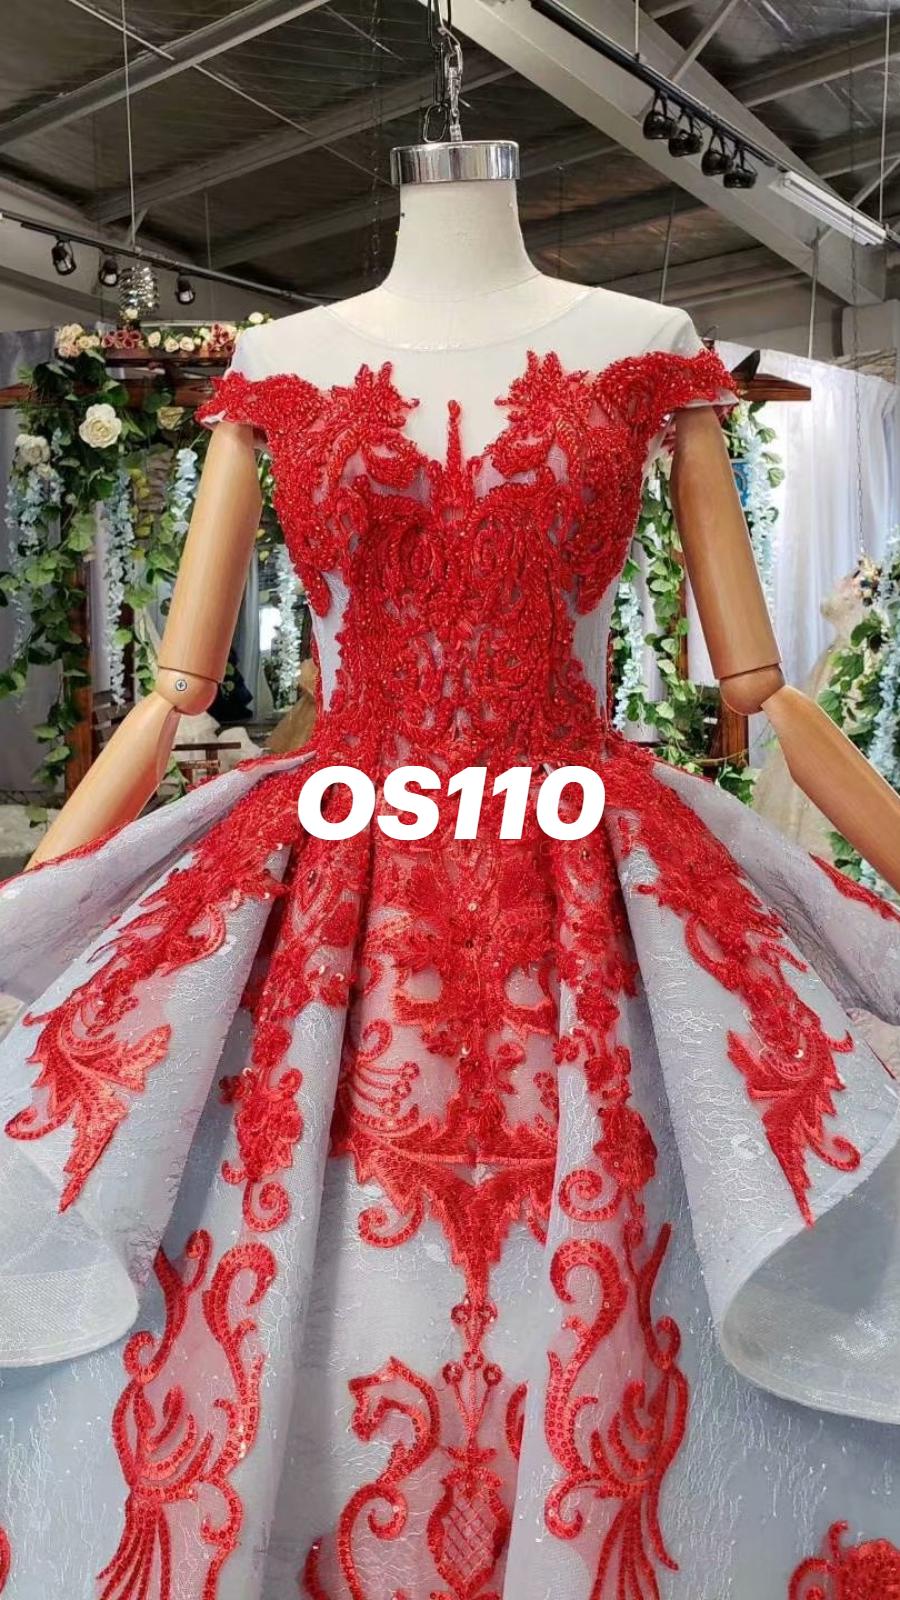 Os110 Red Dress Classy Elegant Midi In 2021 Dresses Gorgeous Prom Dresses Red Dresses Classy [ 1600 x 900 Pixel ]